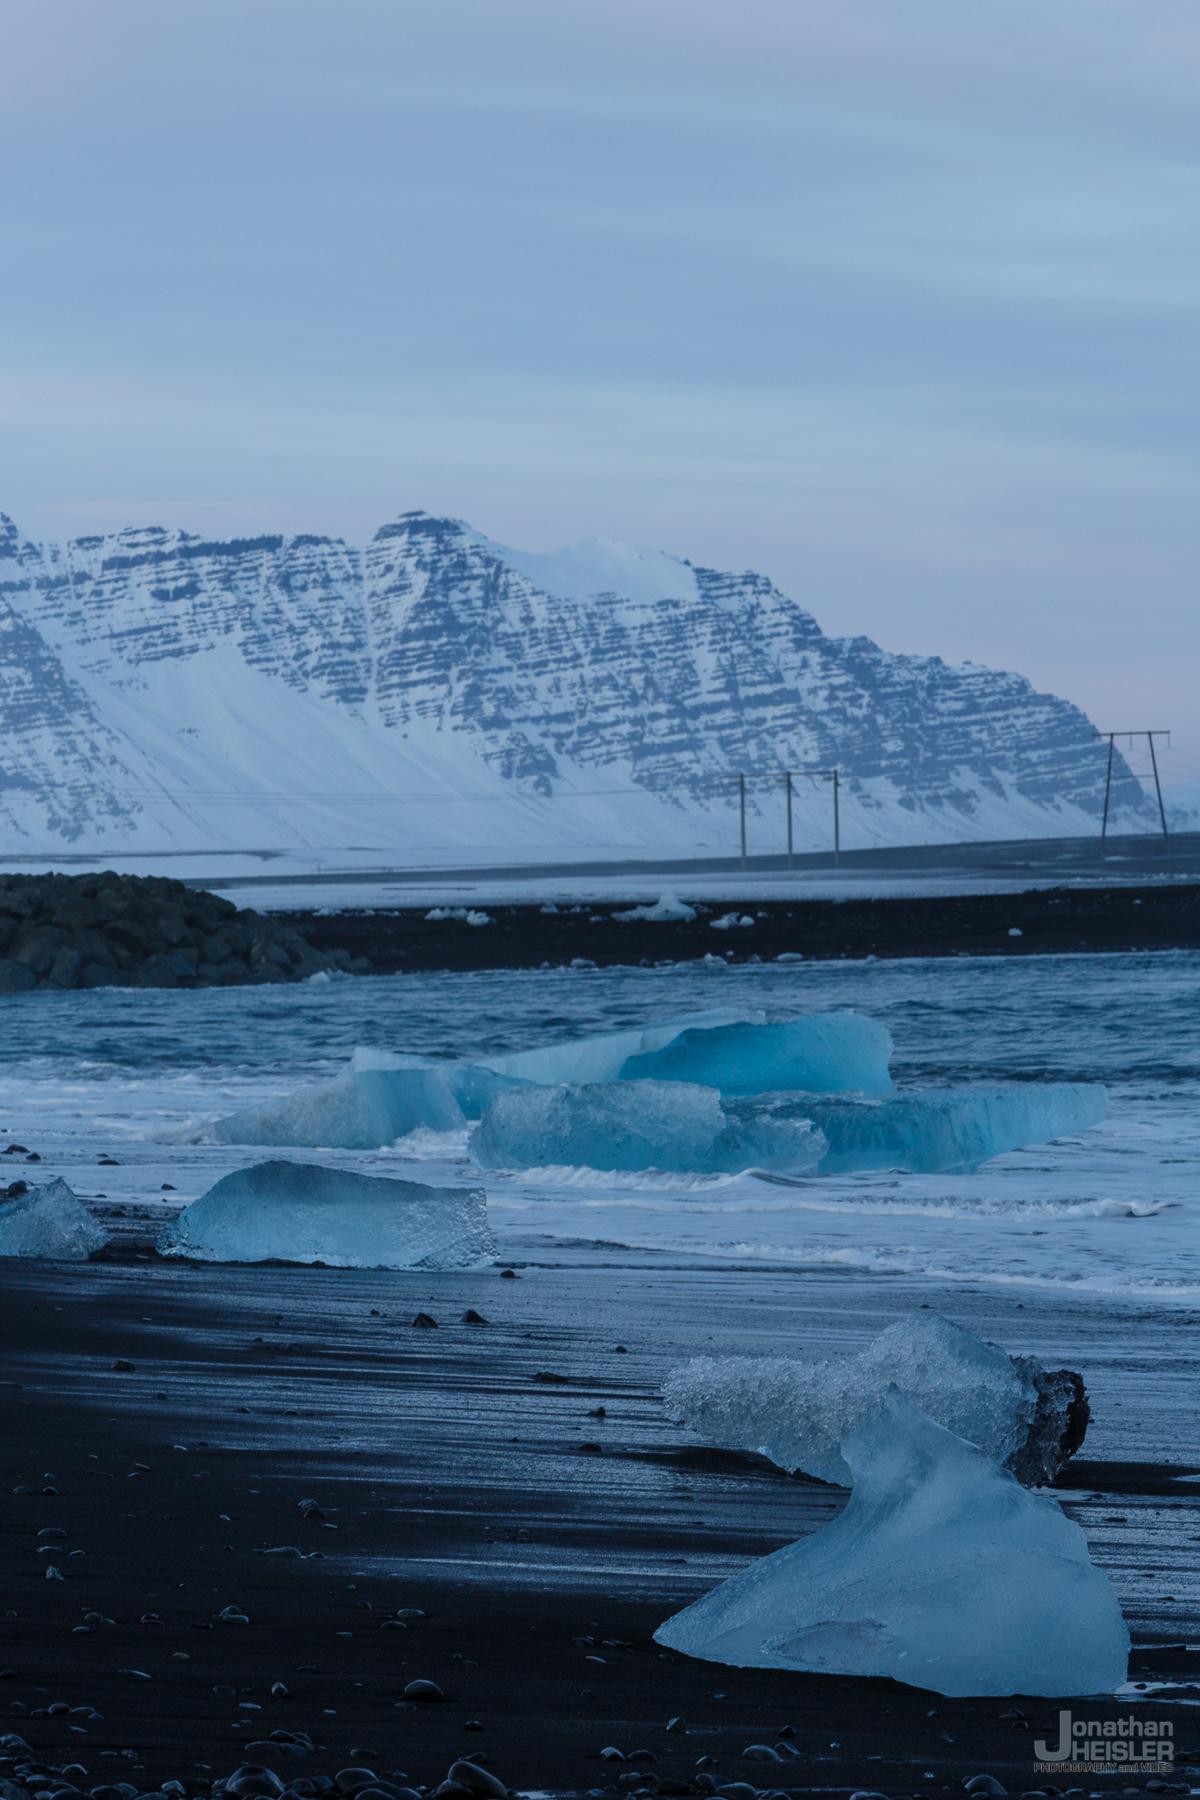 Iceland Winter Photos_  Jonathan Heisler __  02292016 _ 020.jpg